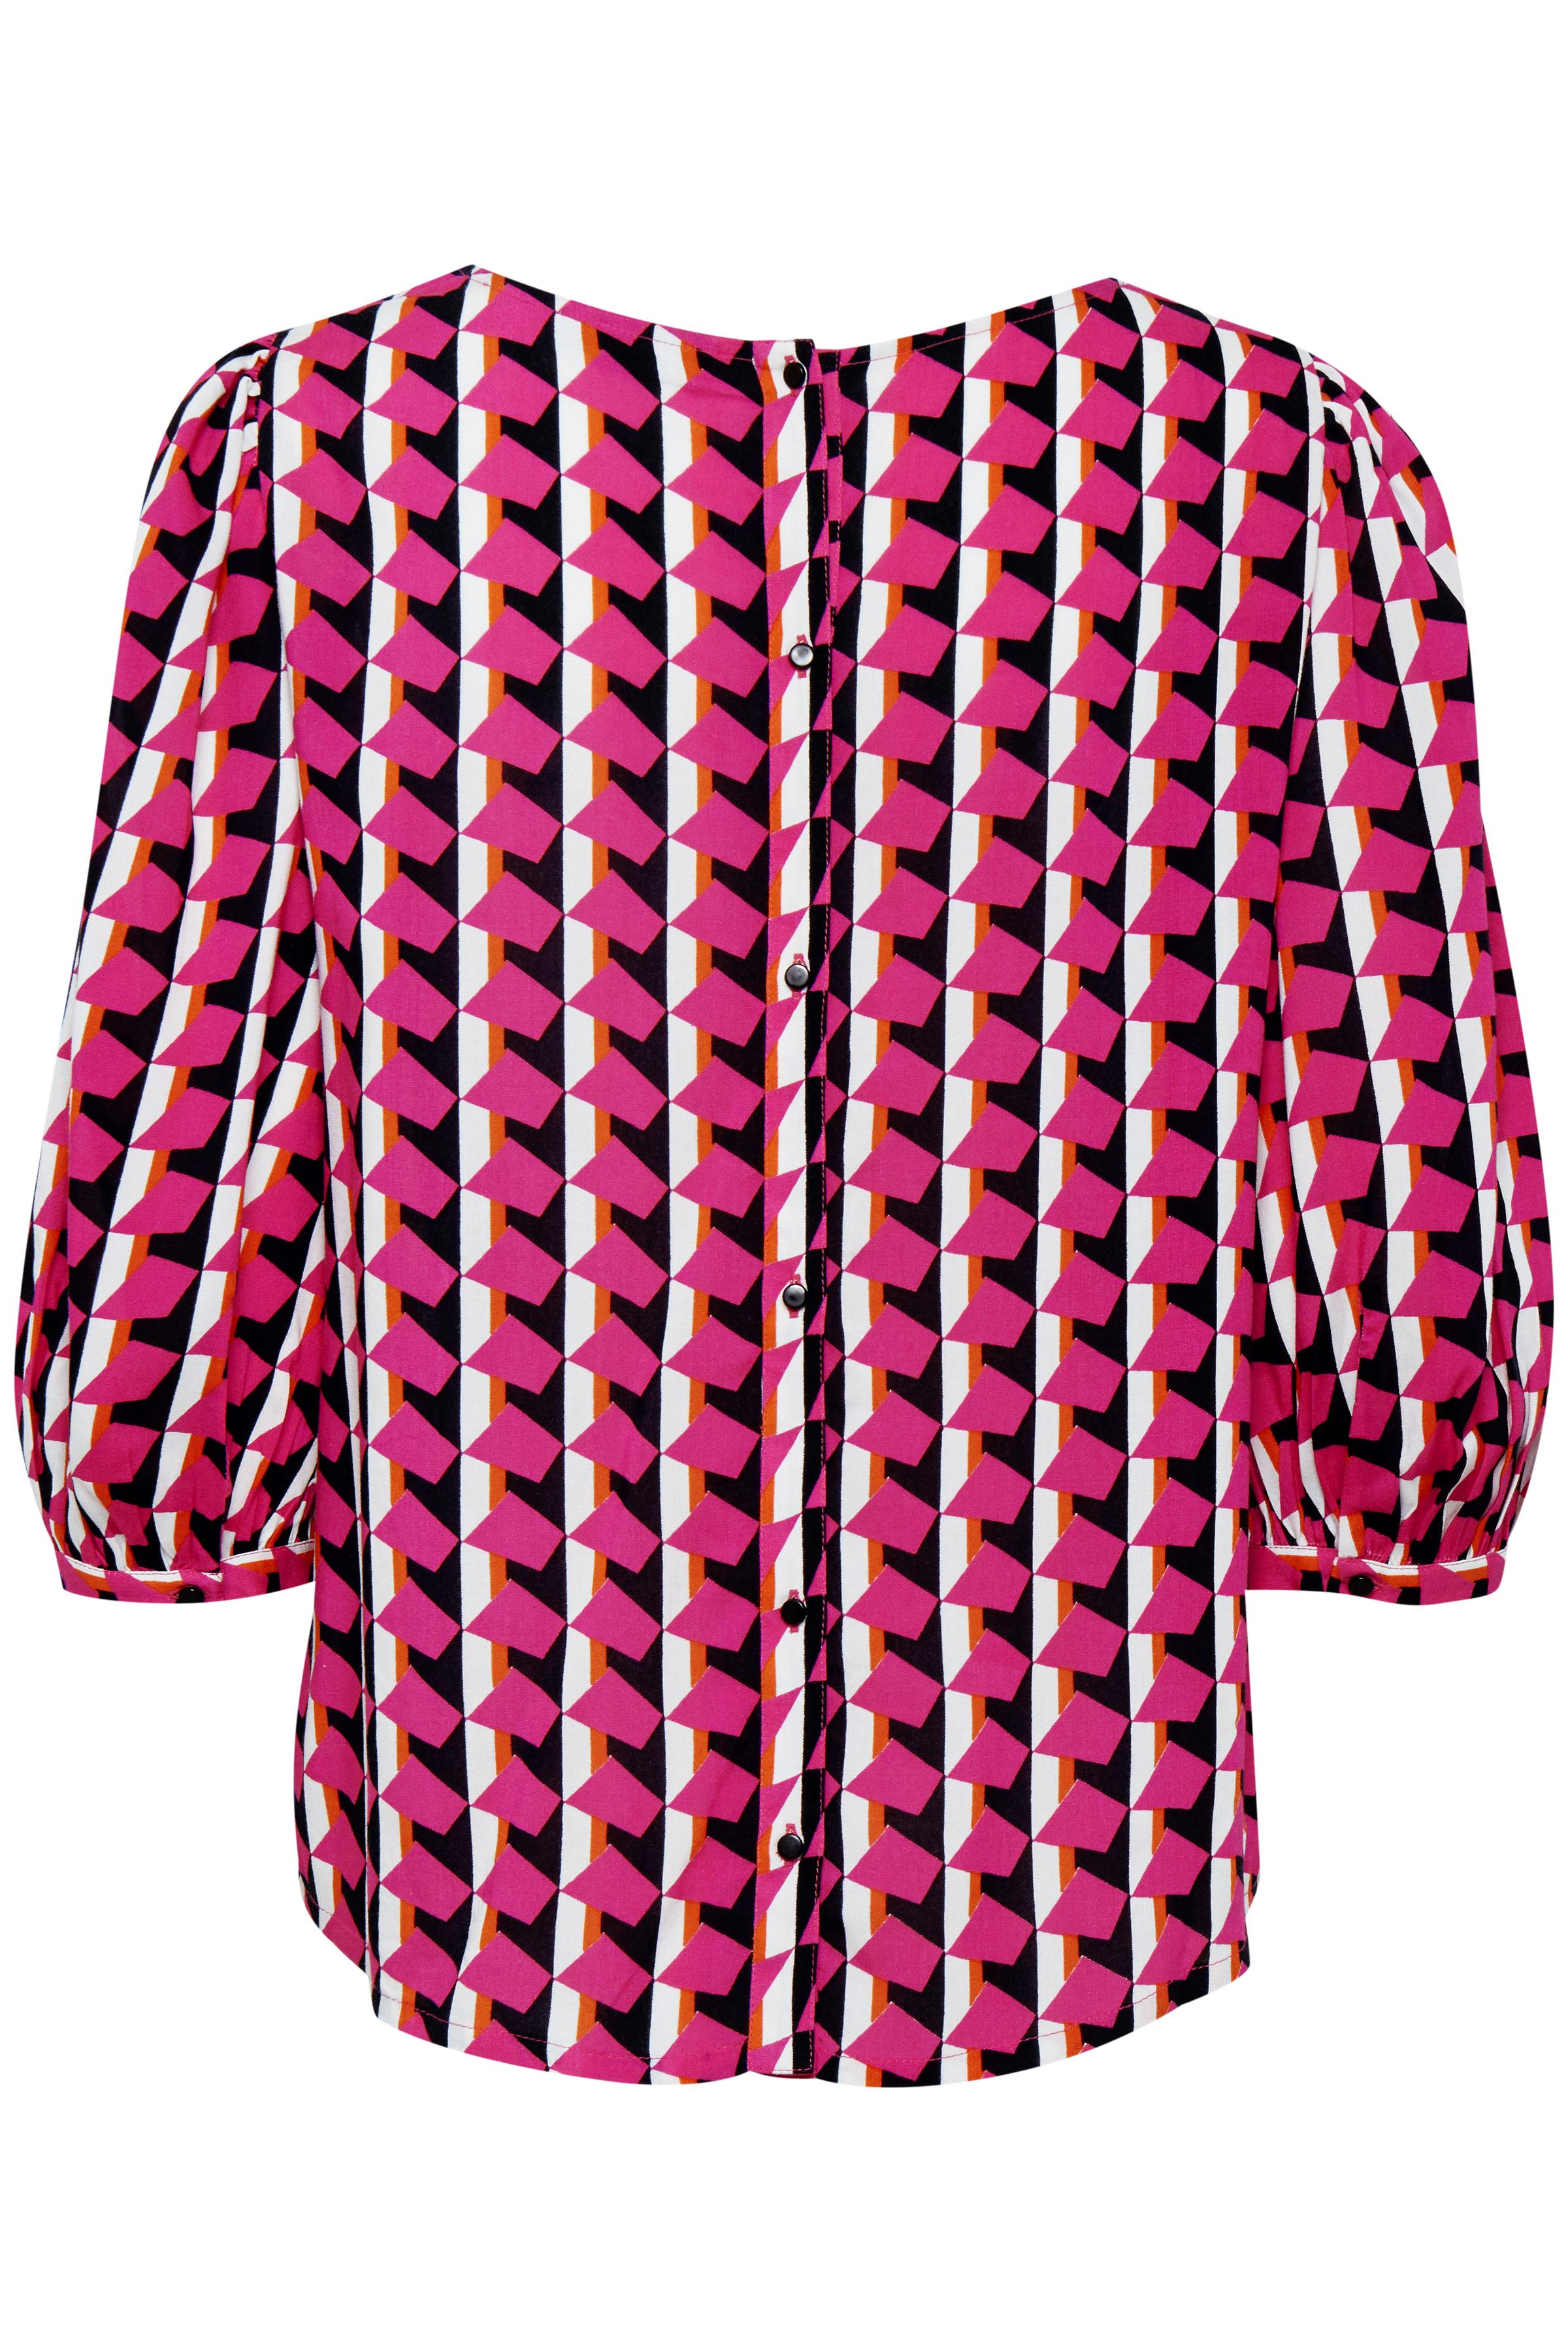 Pink/vit Blus från Fransa – Köp Pink/vit Blus från stl. XS-XXL här